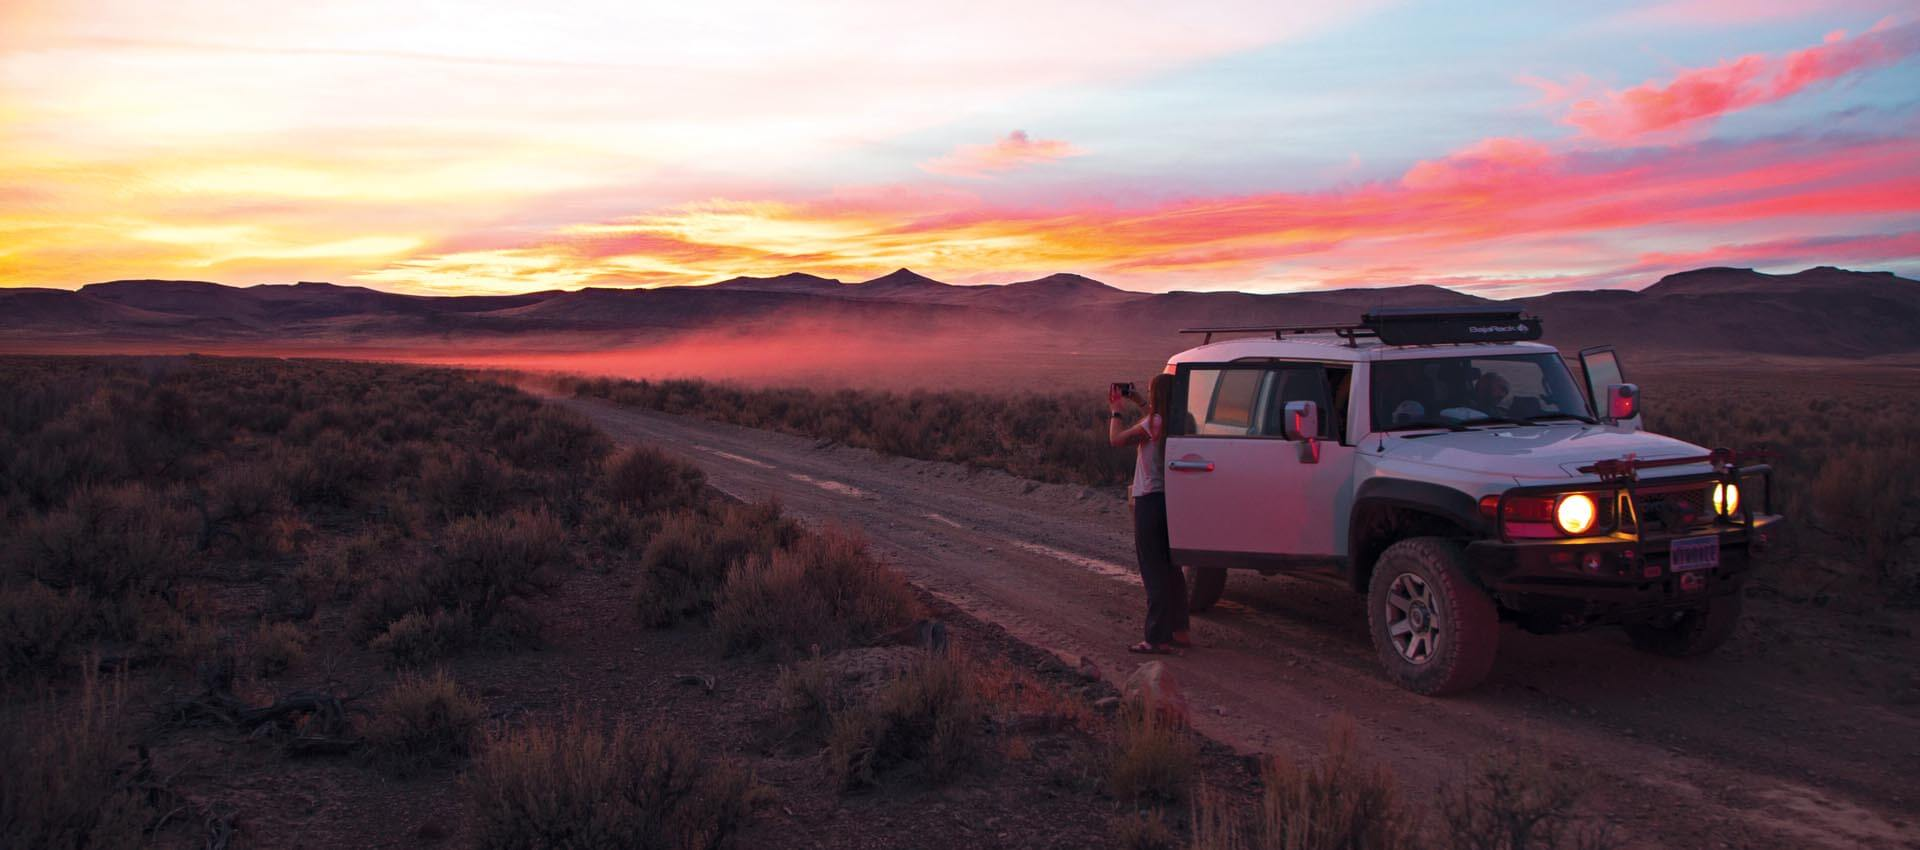 Soldier Meadows, North of Gerlach Nevada